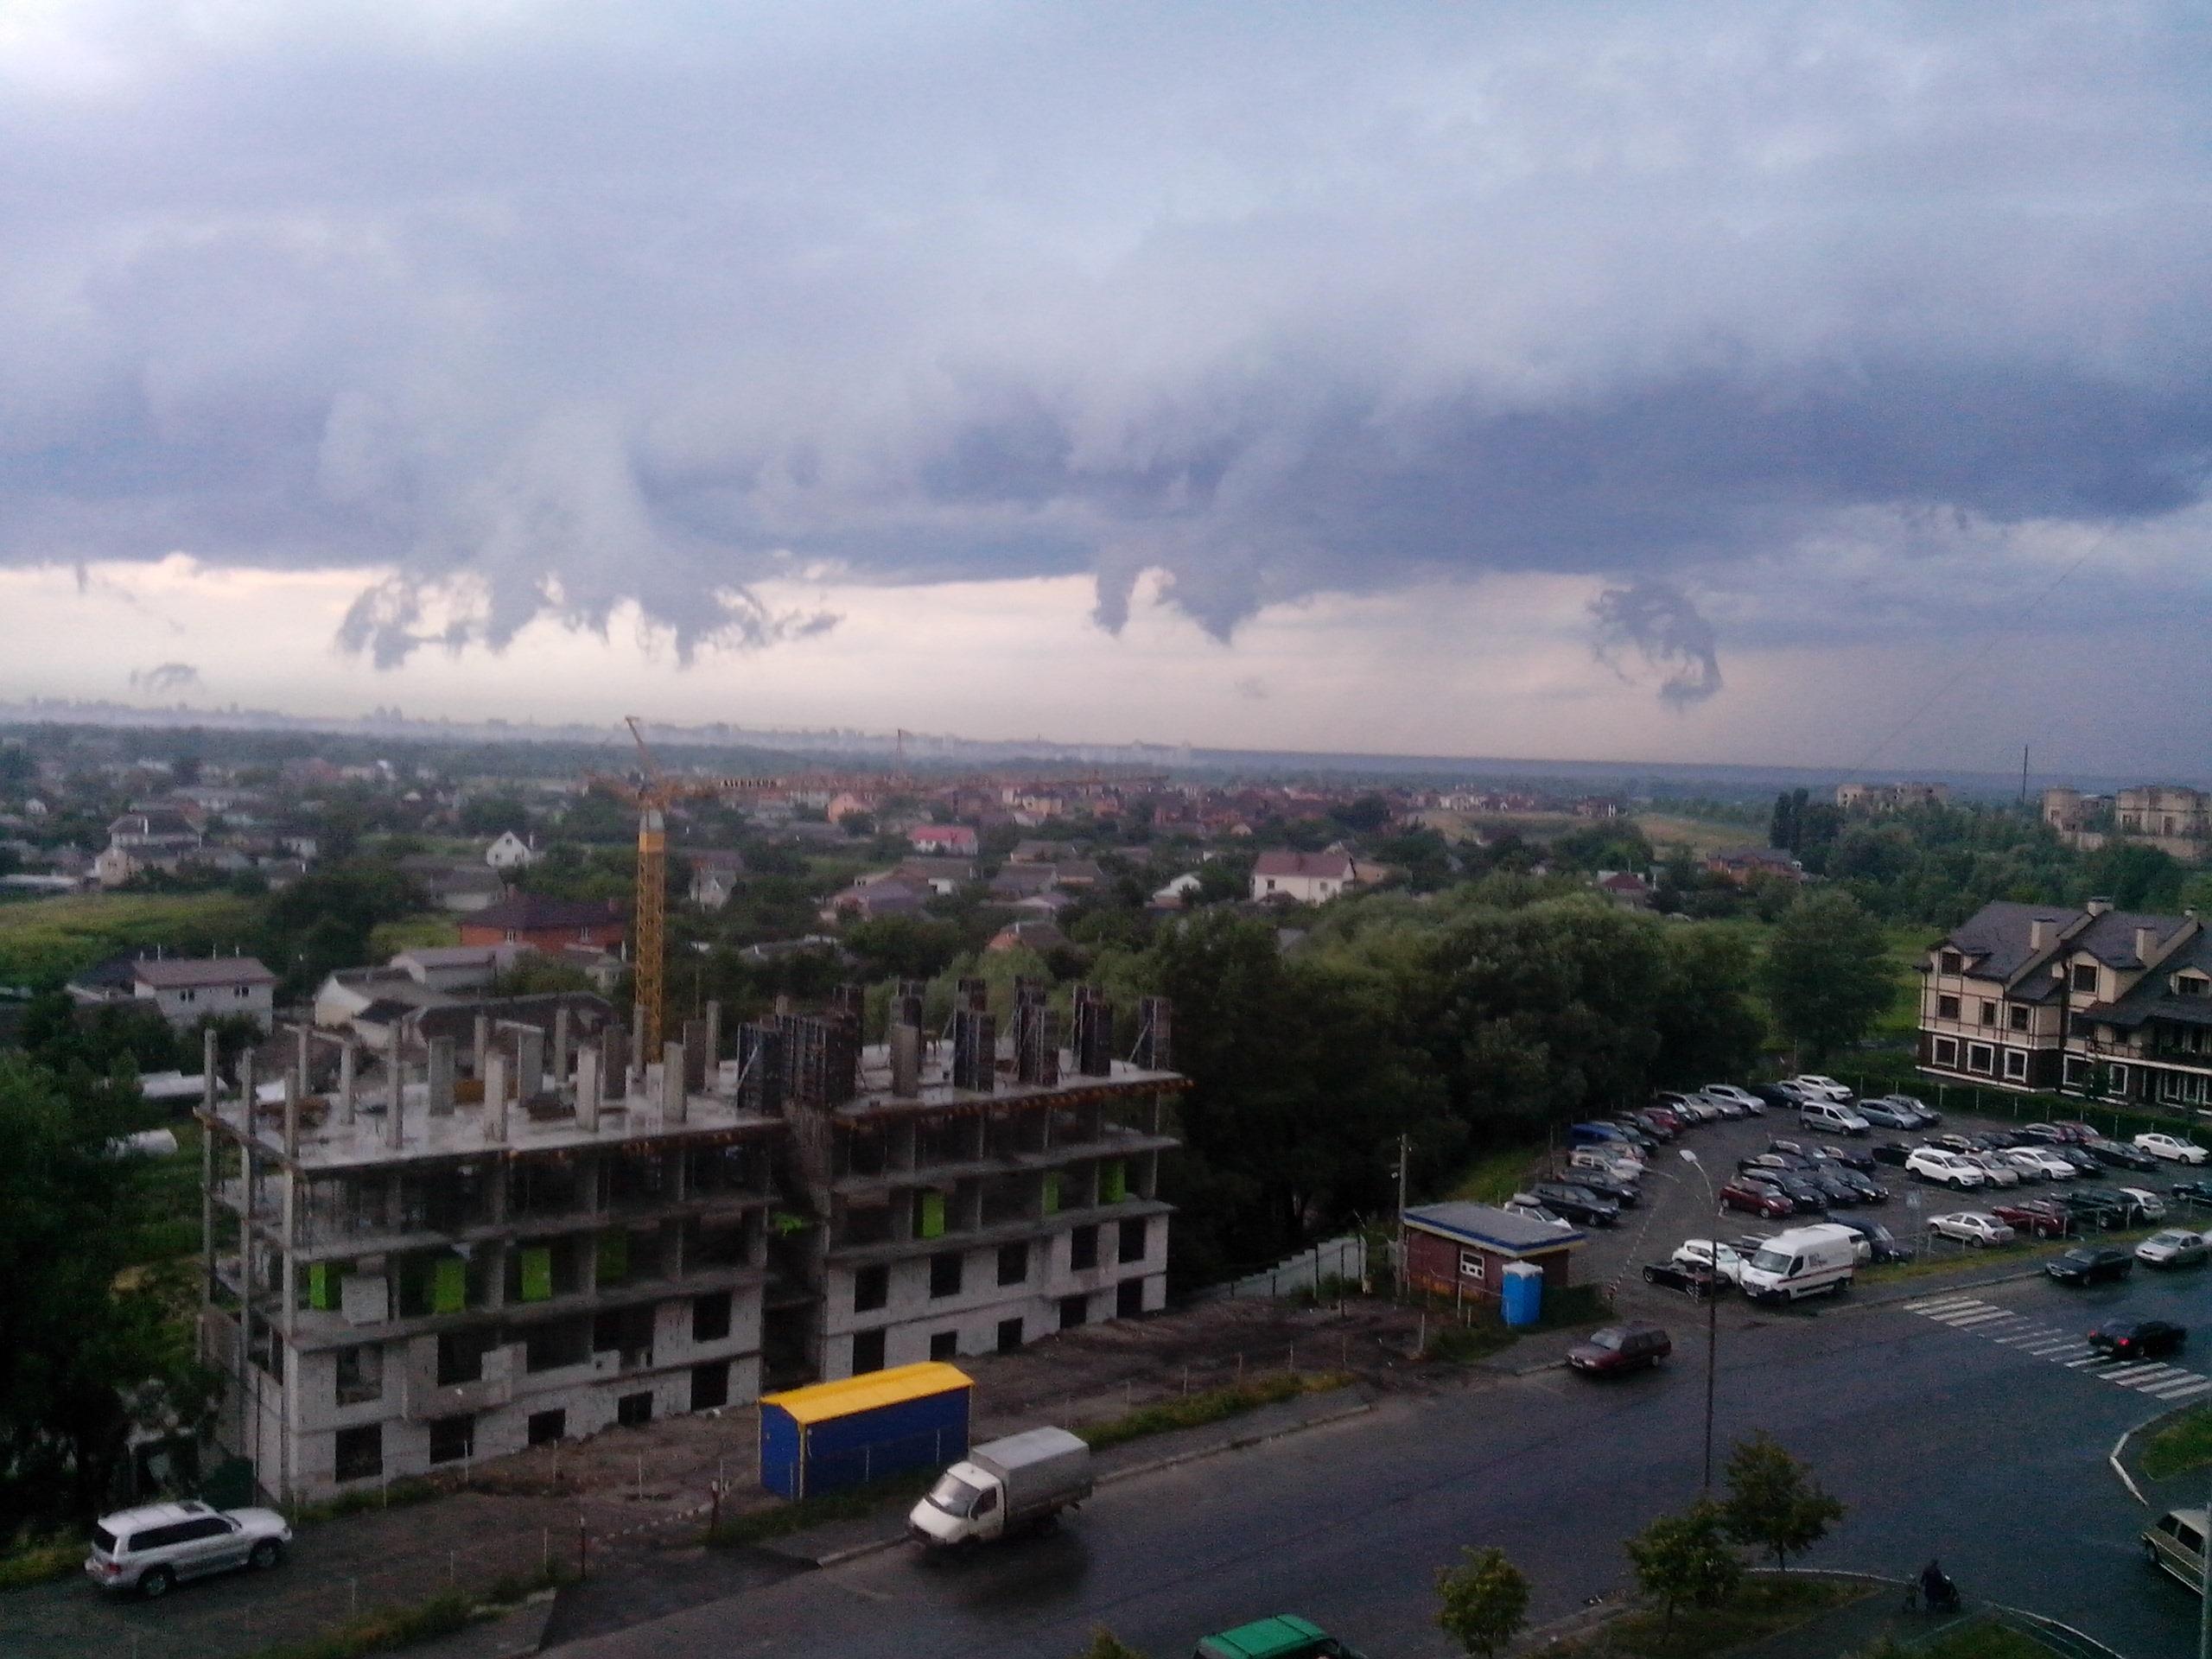 шугаринг в украине цена